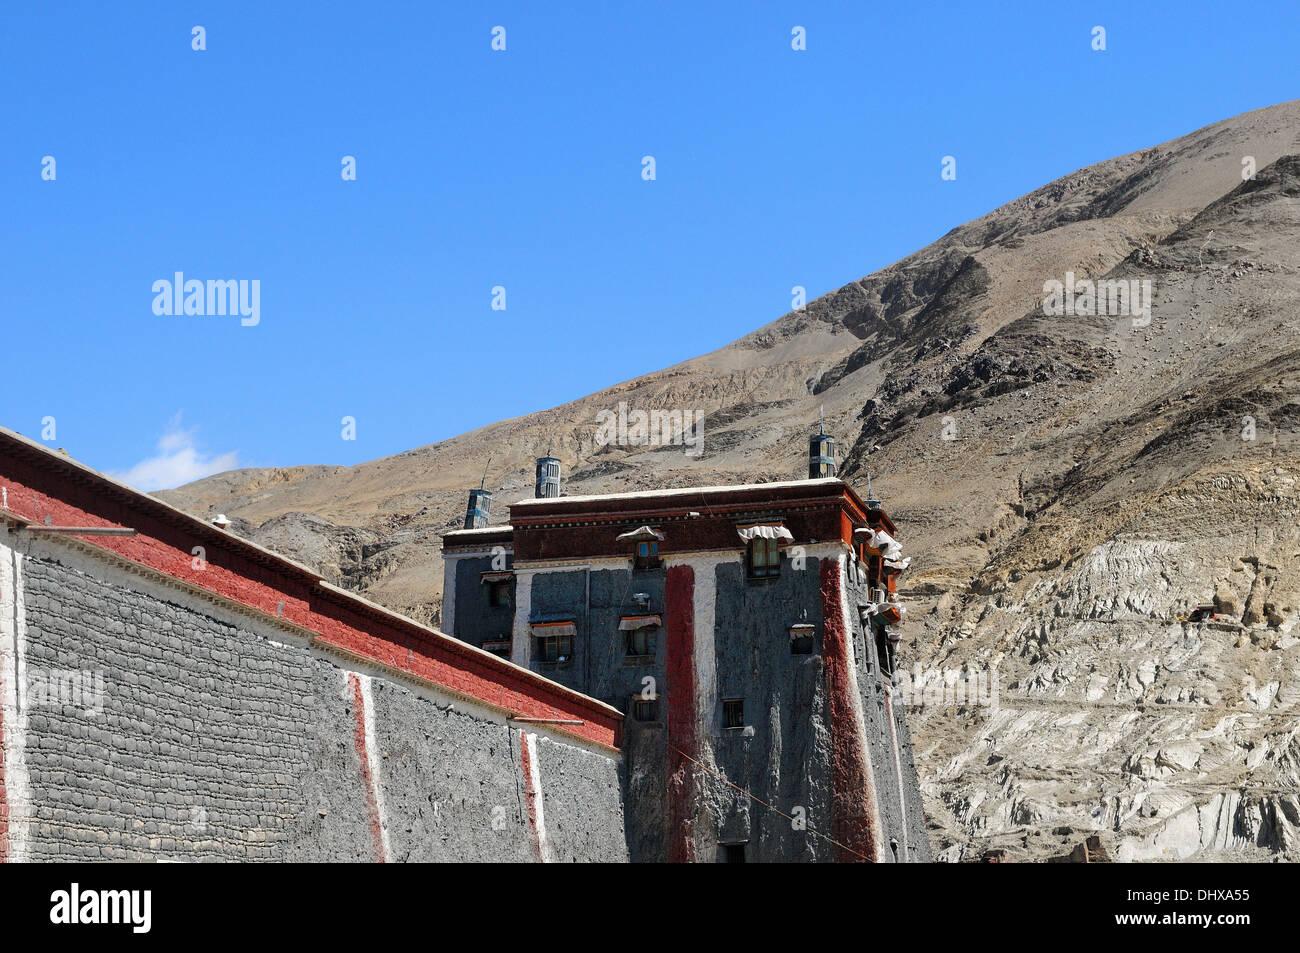 Sakya Monastery in Shigatse Tibet China - Stock Image